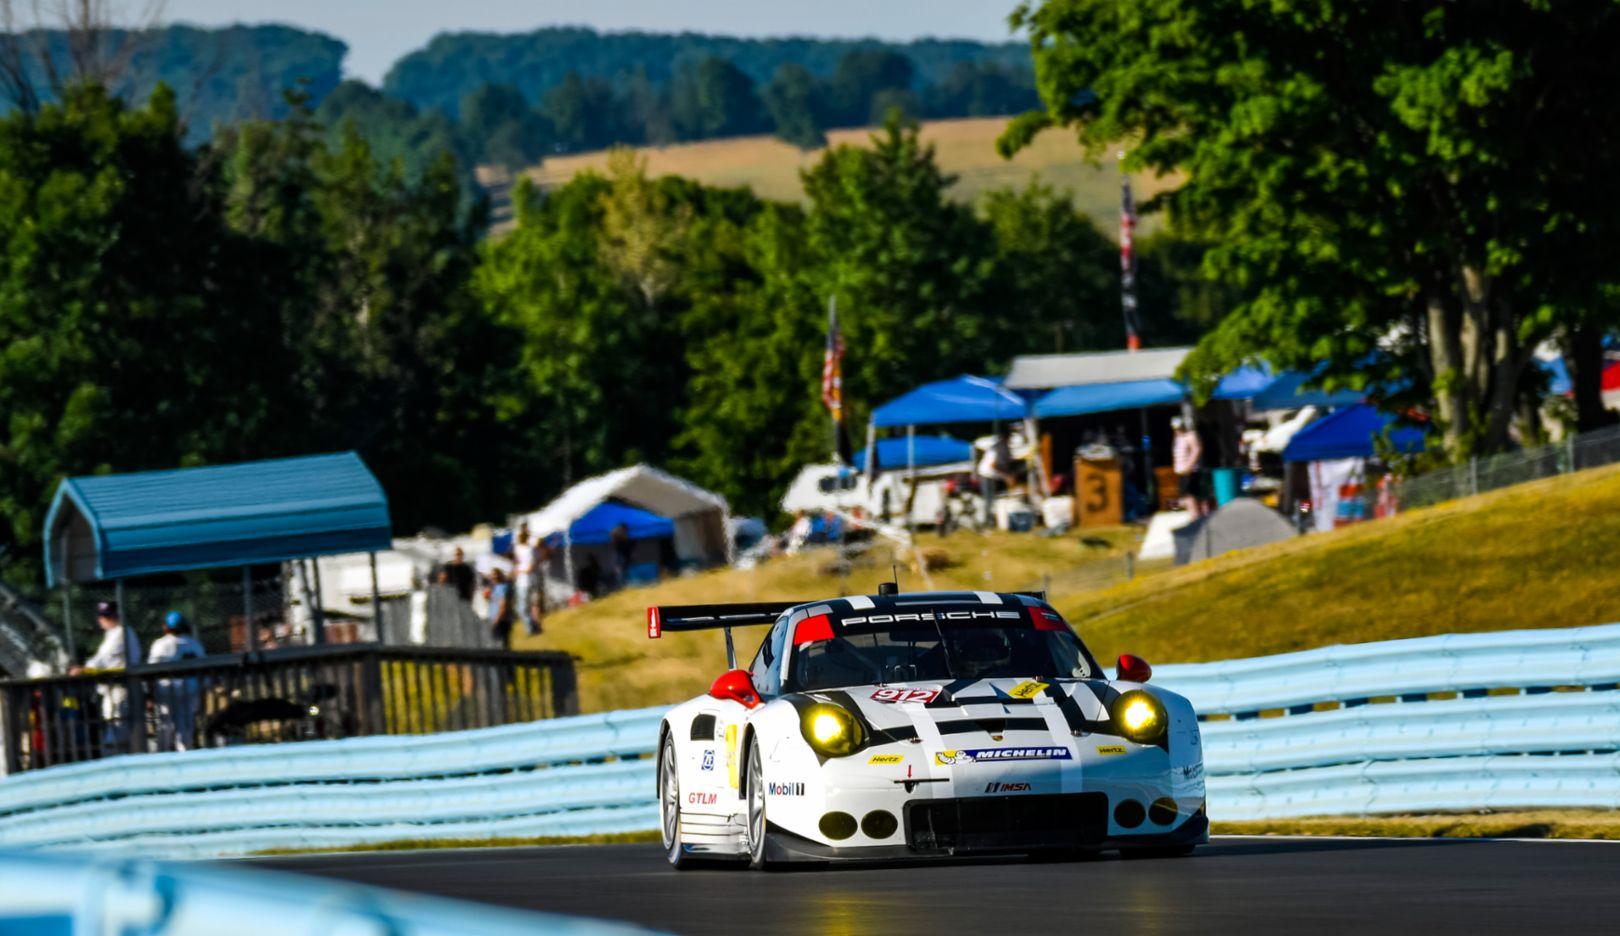 Porsche 911 RSR, Watkins Glen, IMSA WeatherTech SportsCar Championship, 2016, Porsche AG